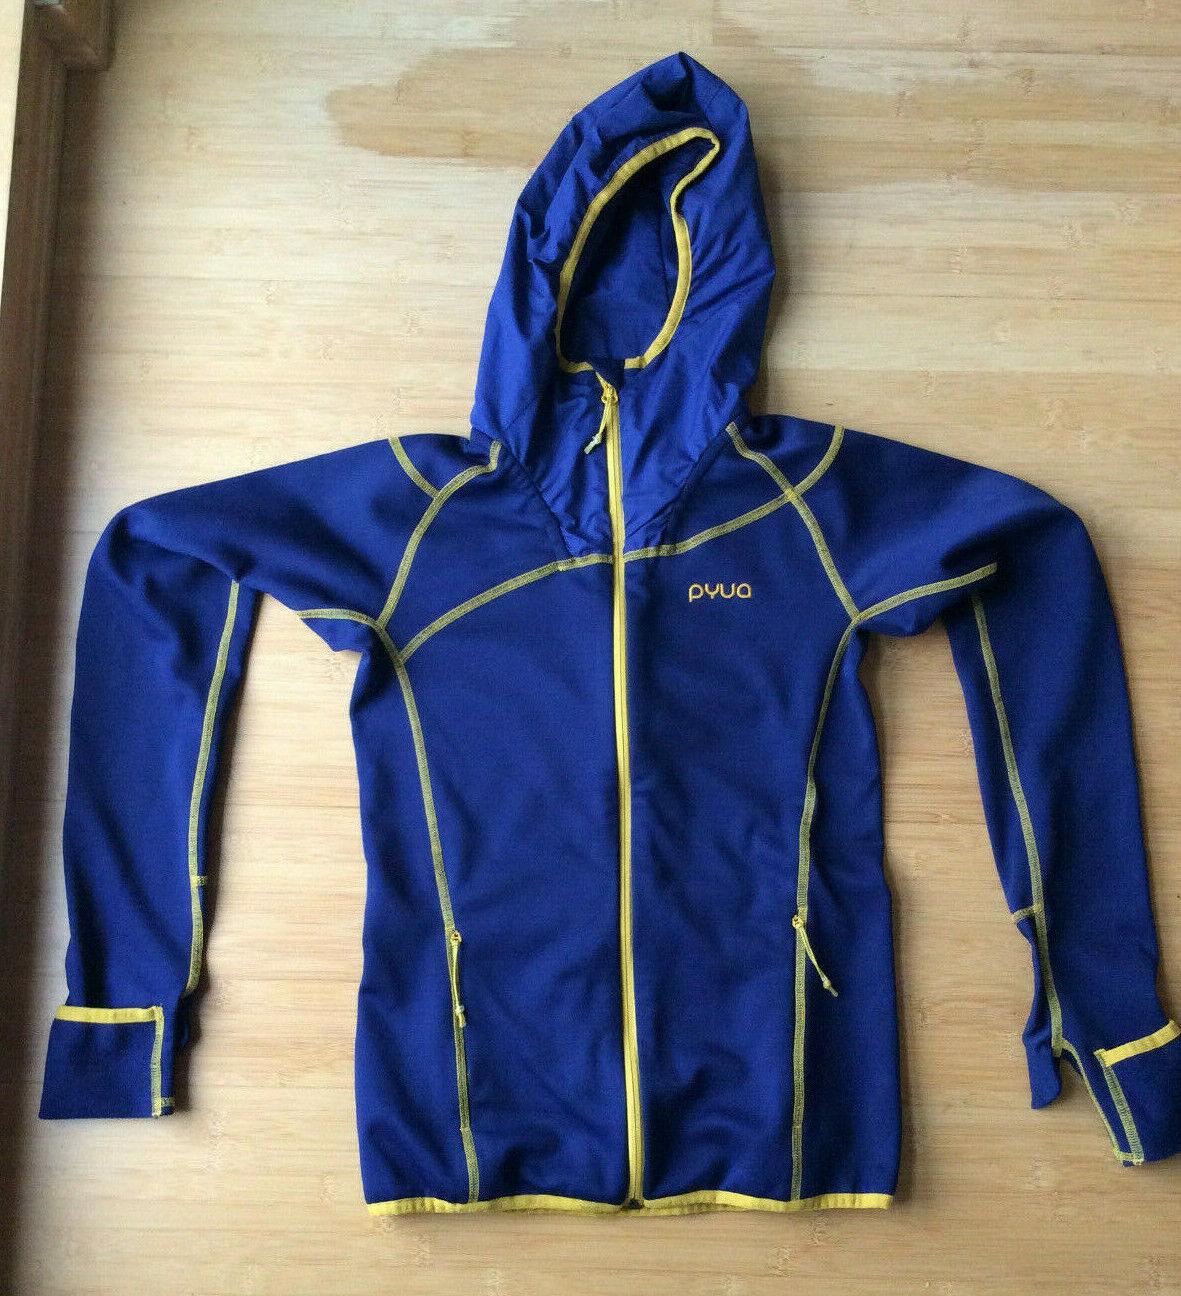 PYUA Ascend Fleece Jacket Frauen Sport Ski Laufen Jogging Größe XS Farbe  Blau